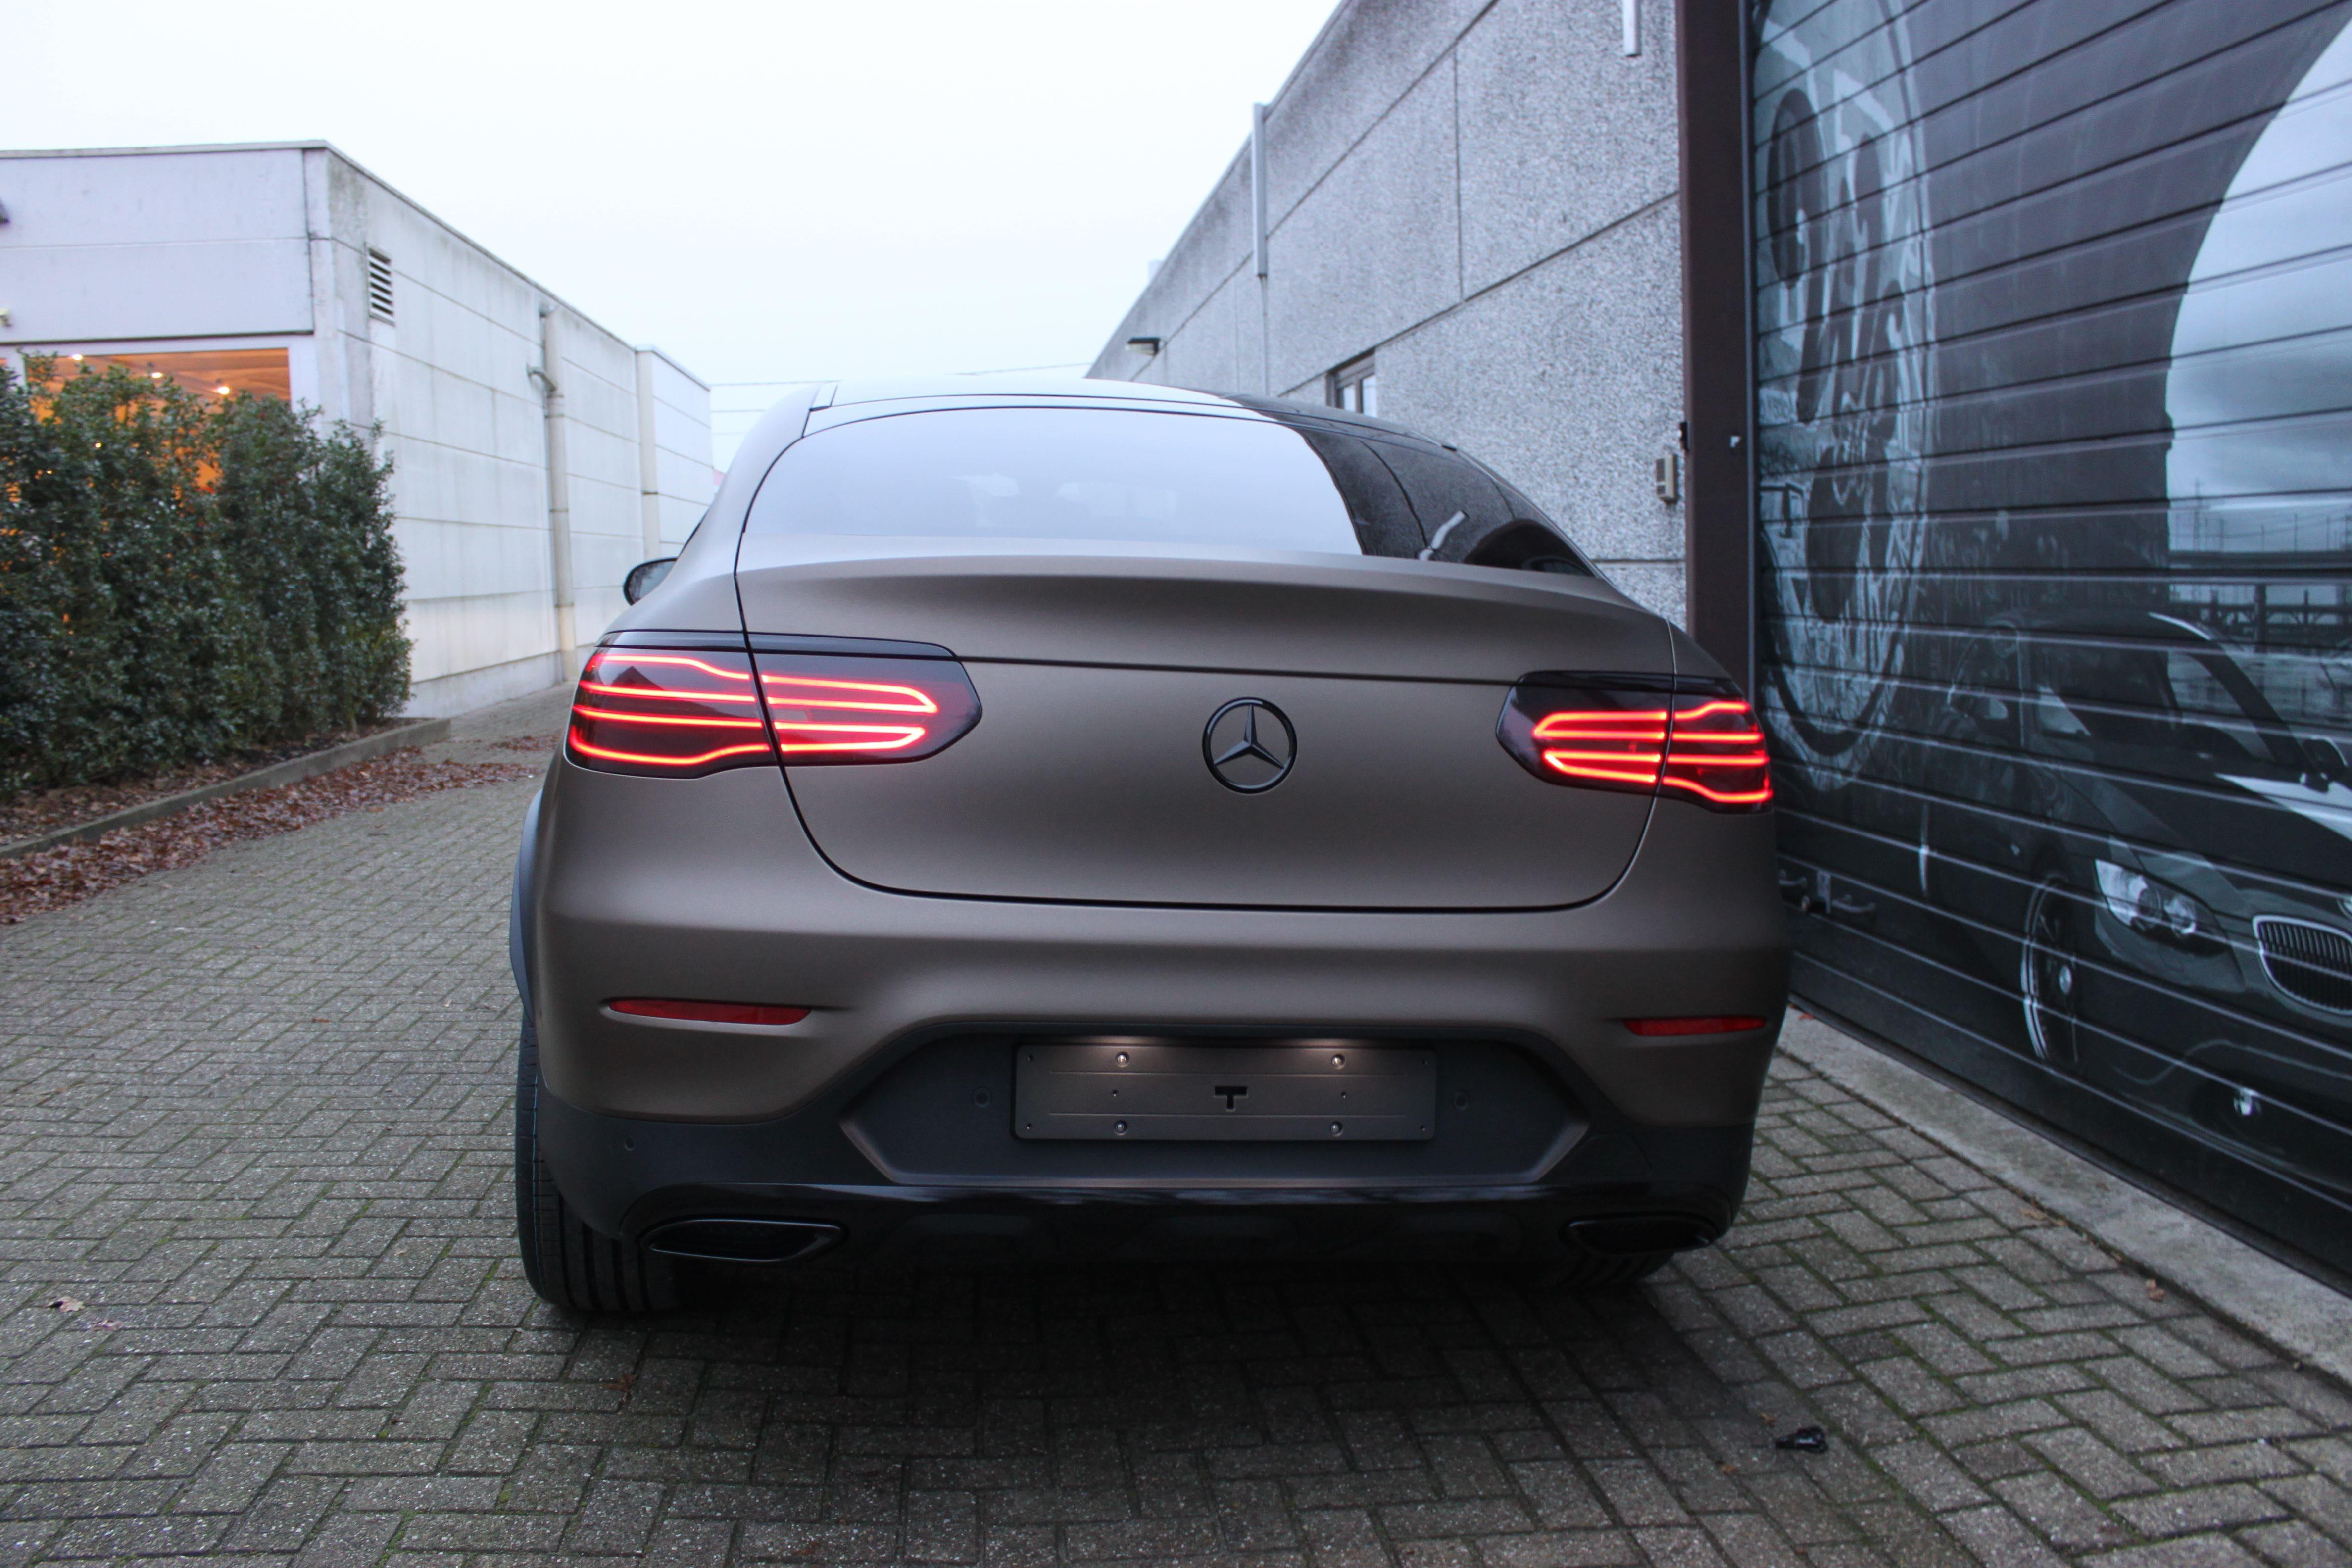 Mercedes GLC Coupe Matte metallic brown, Carwrapping door Wrapmyride.nu Foto-nr:9350, ©2021